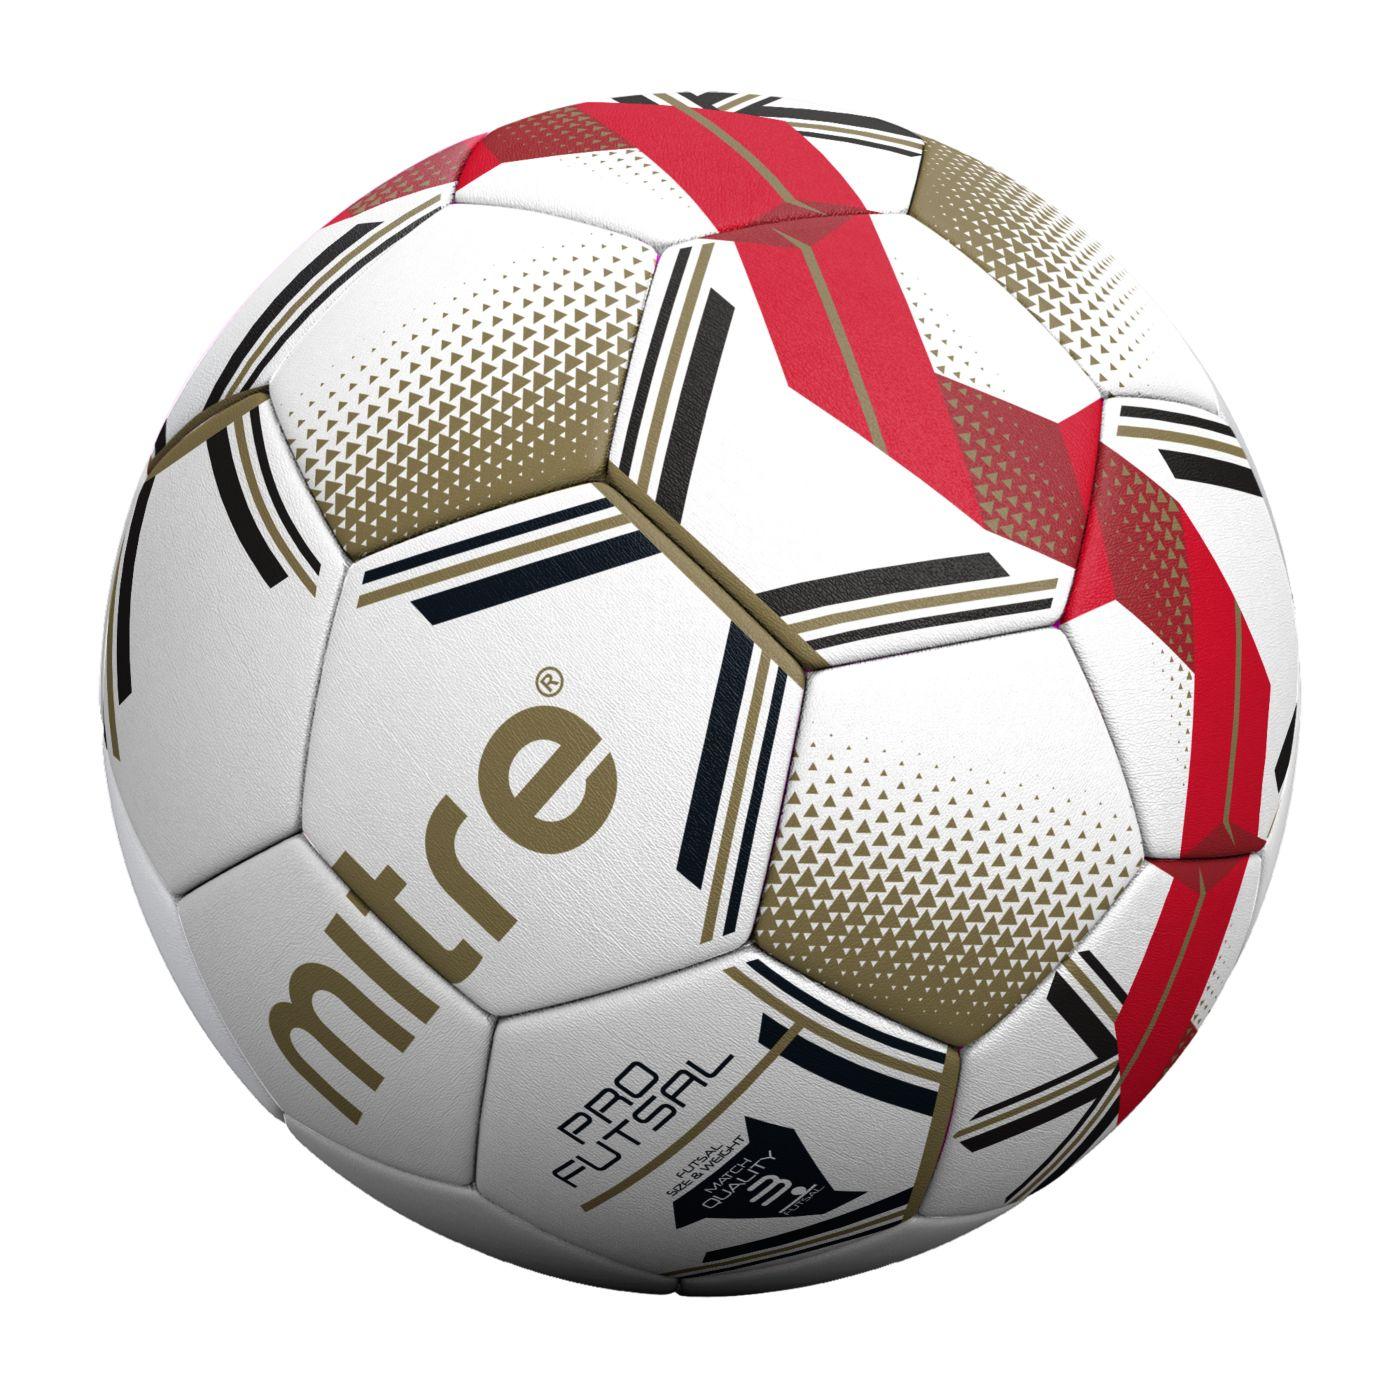 mitre Pro Futsal Soccer Ball